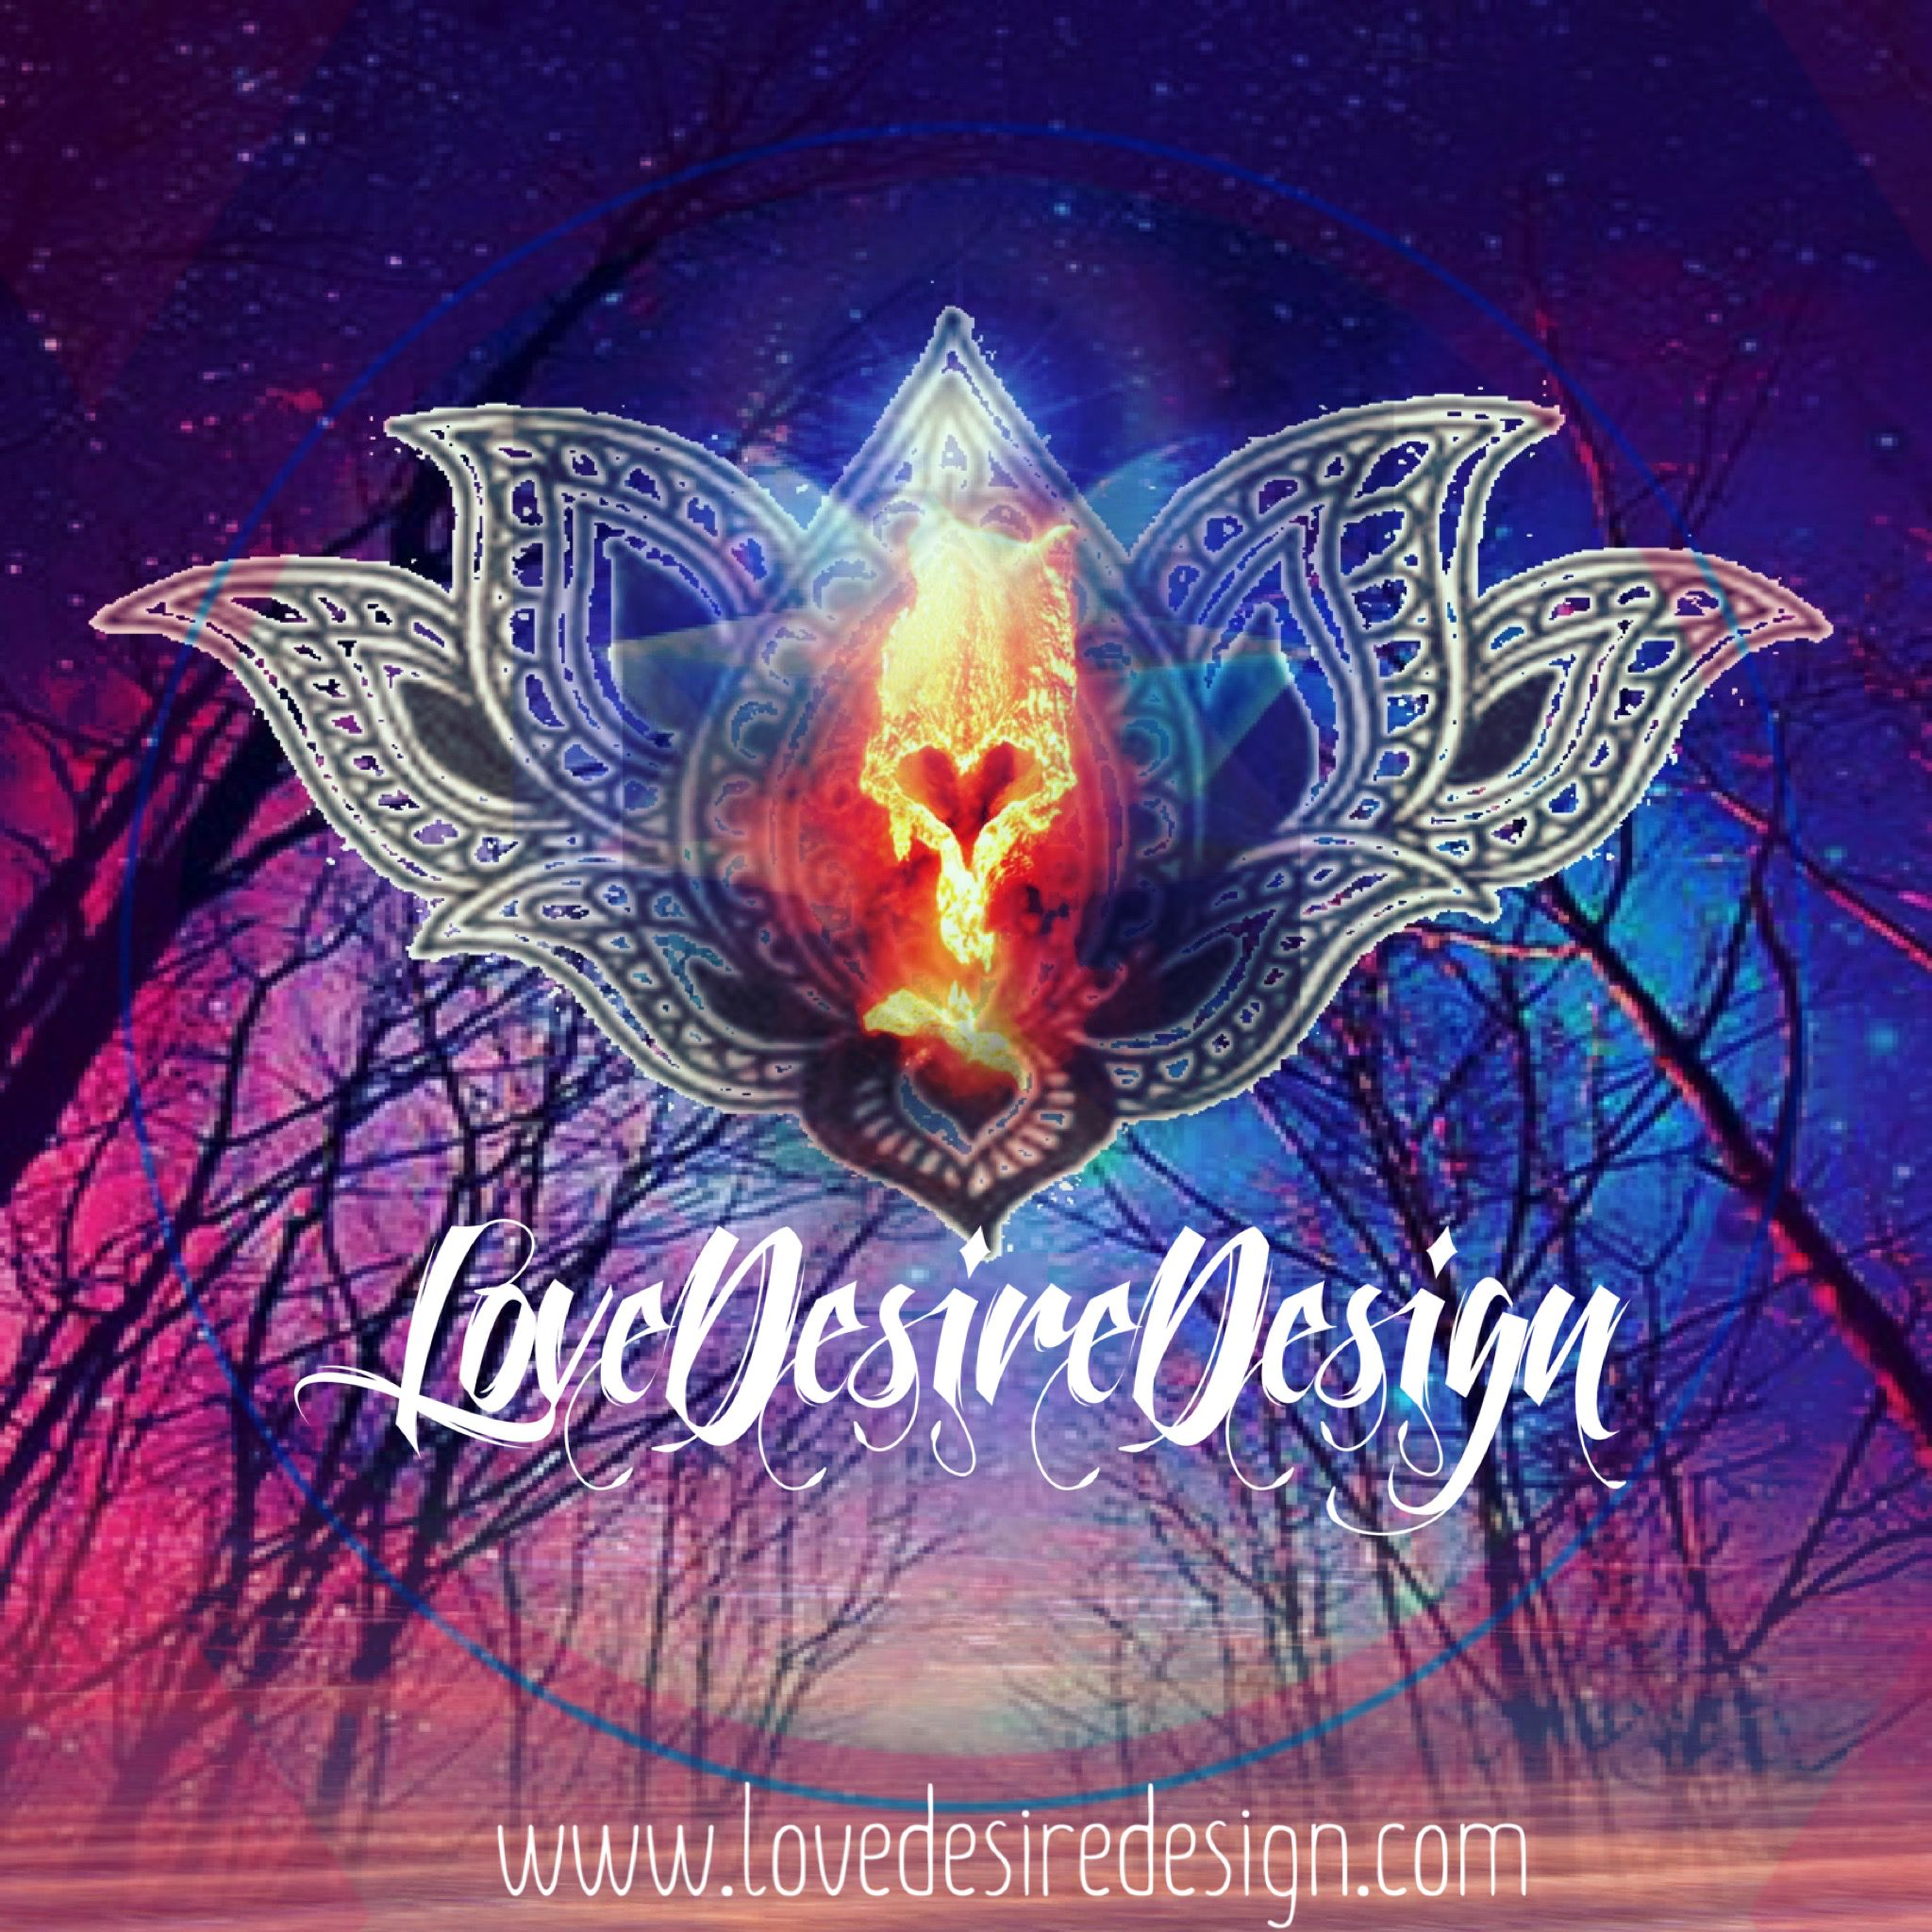 www.lovedesiredesign.com